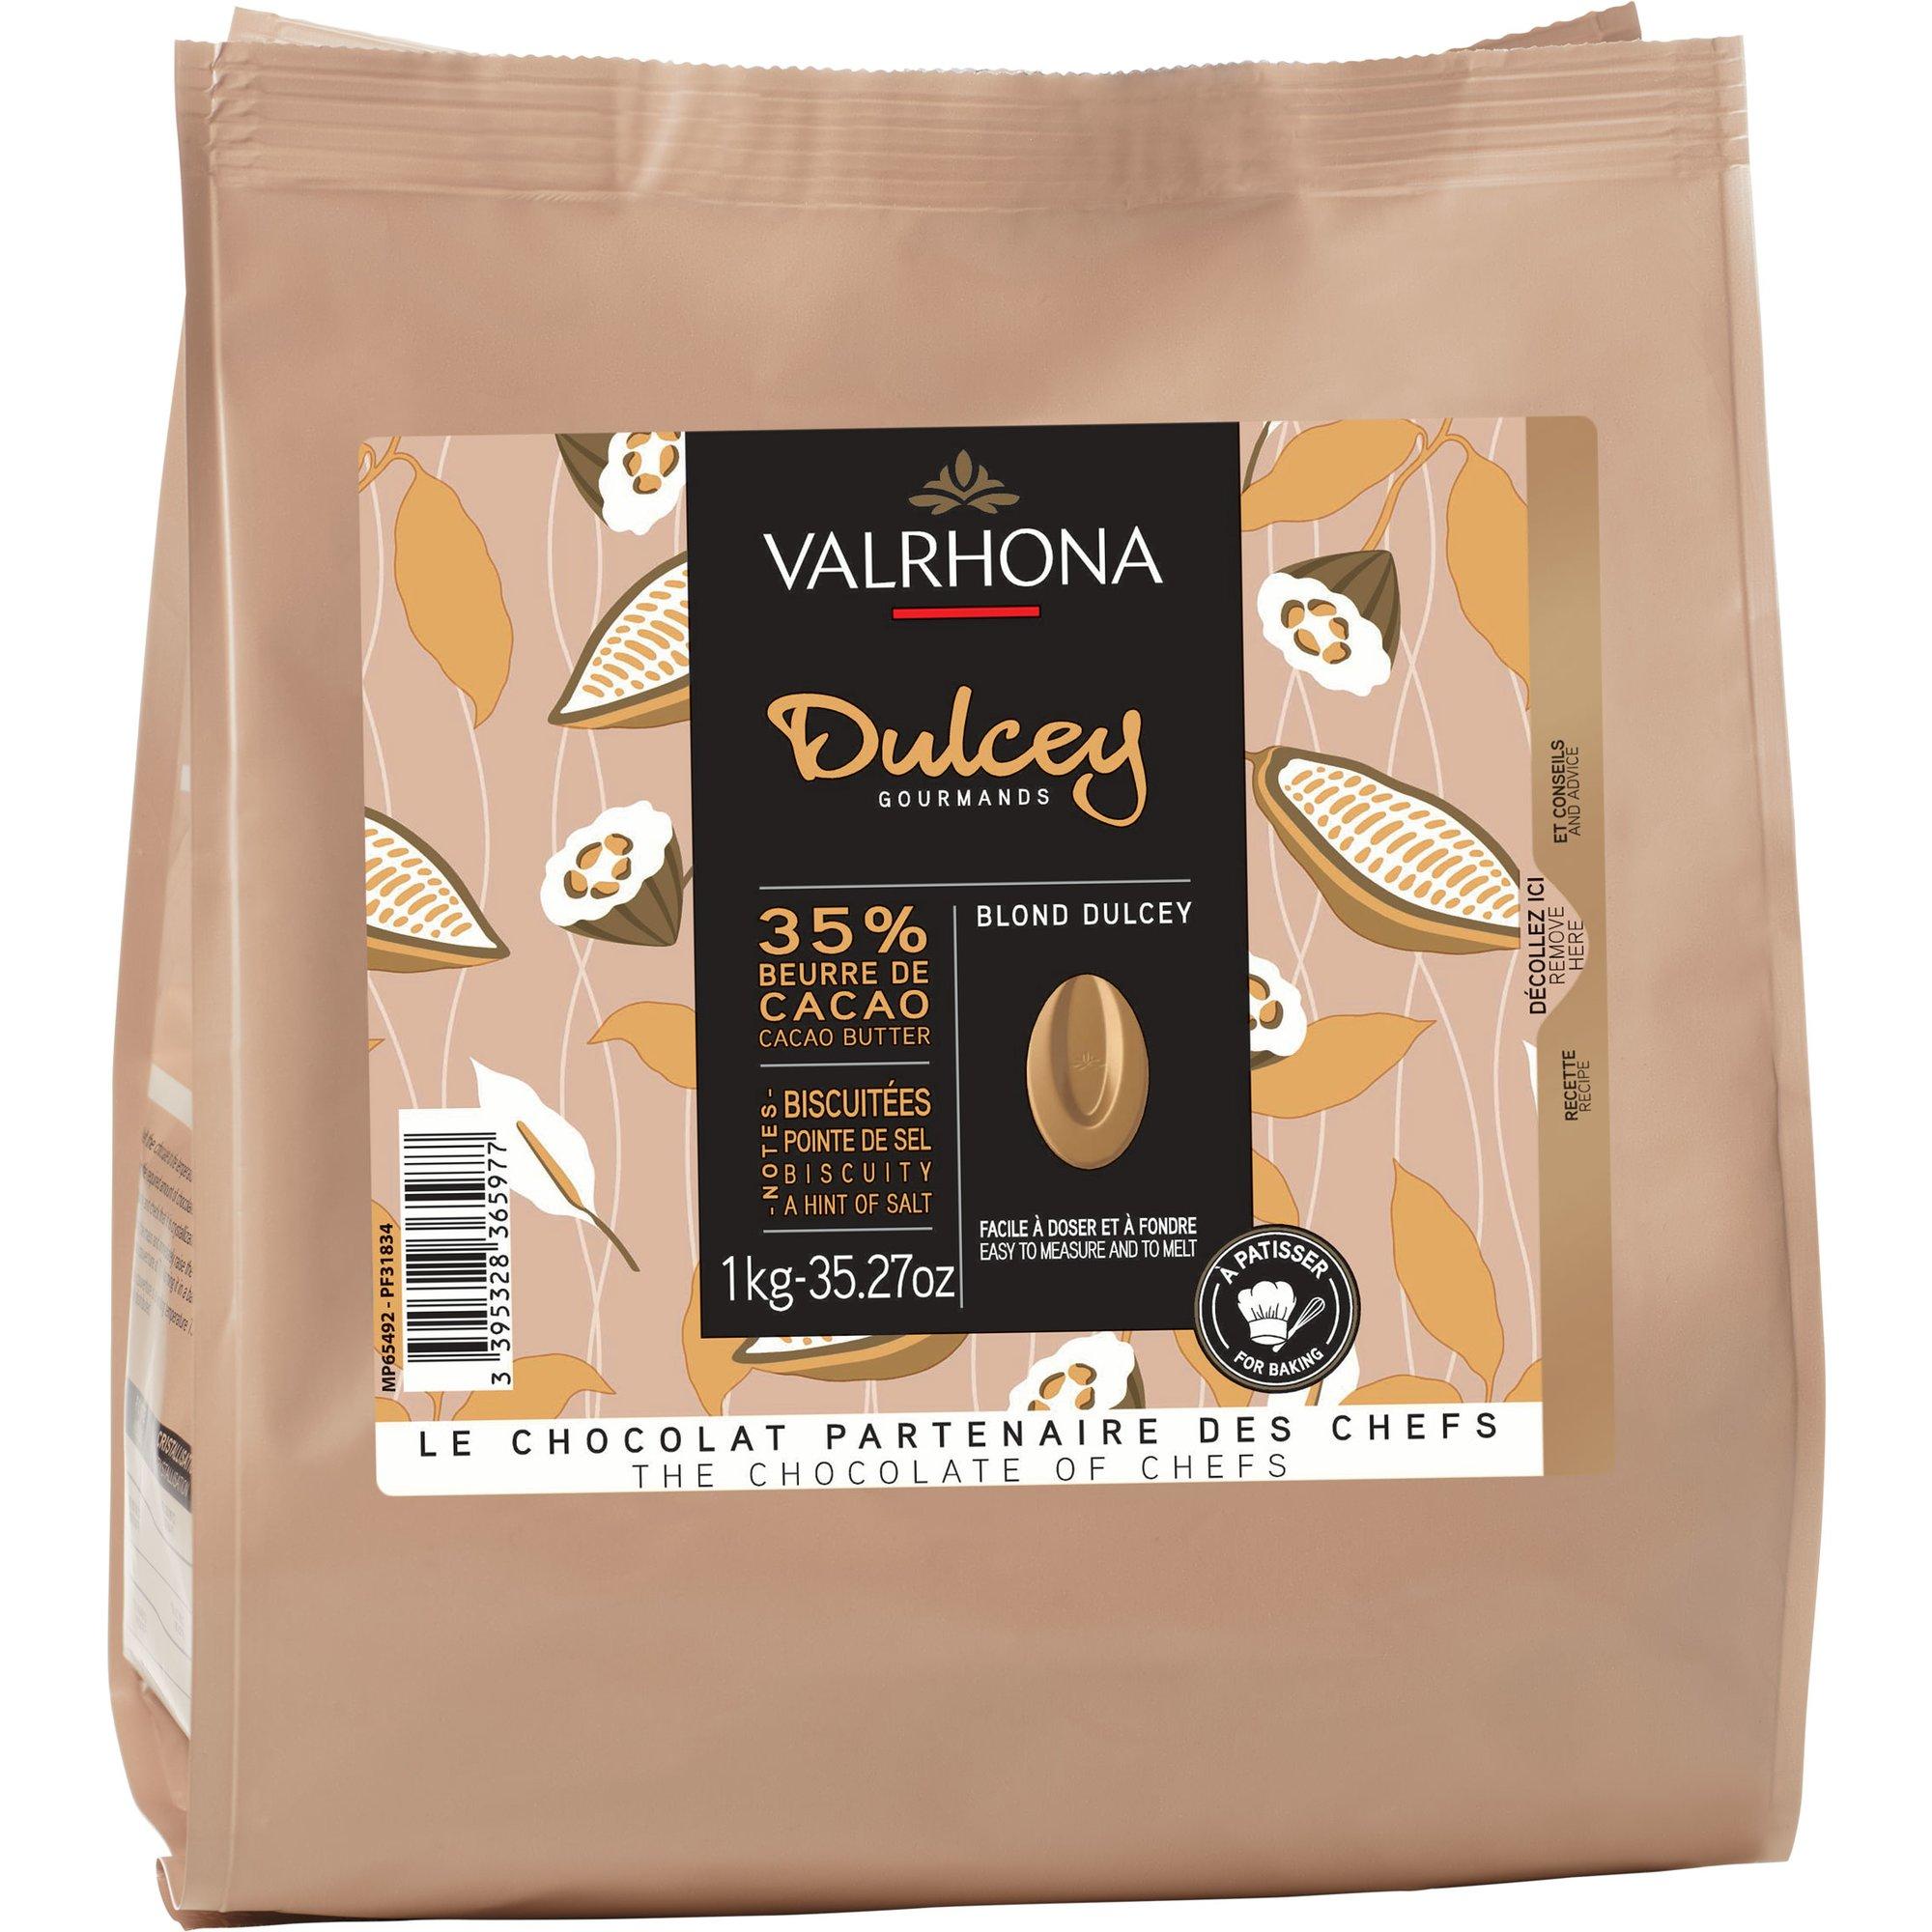 Valrhona Dulcey 35 % 1 kg